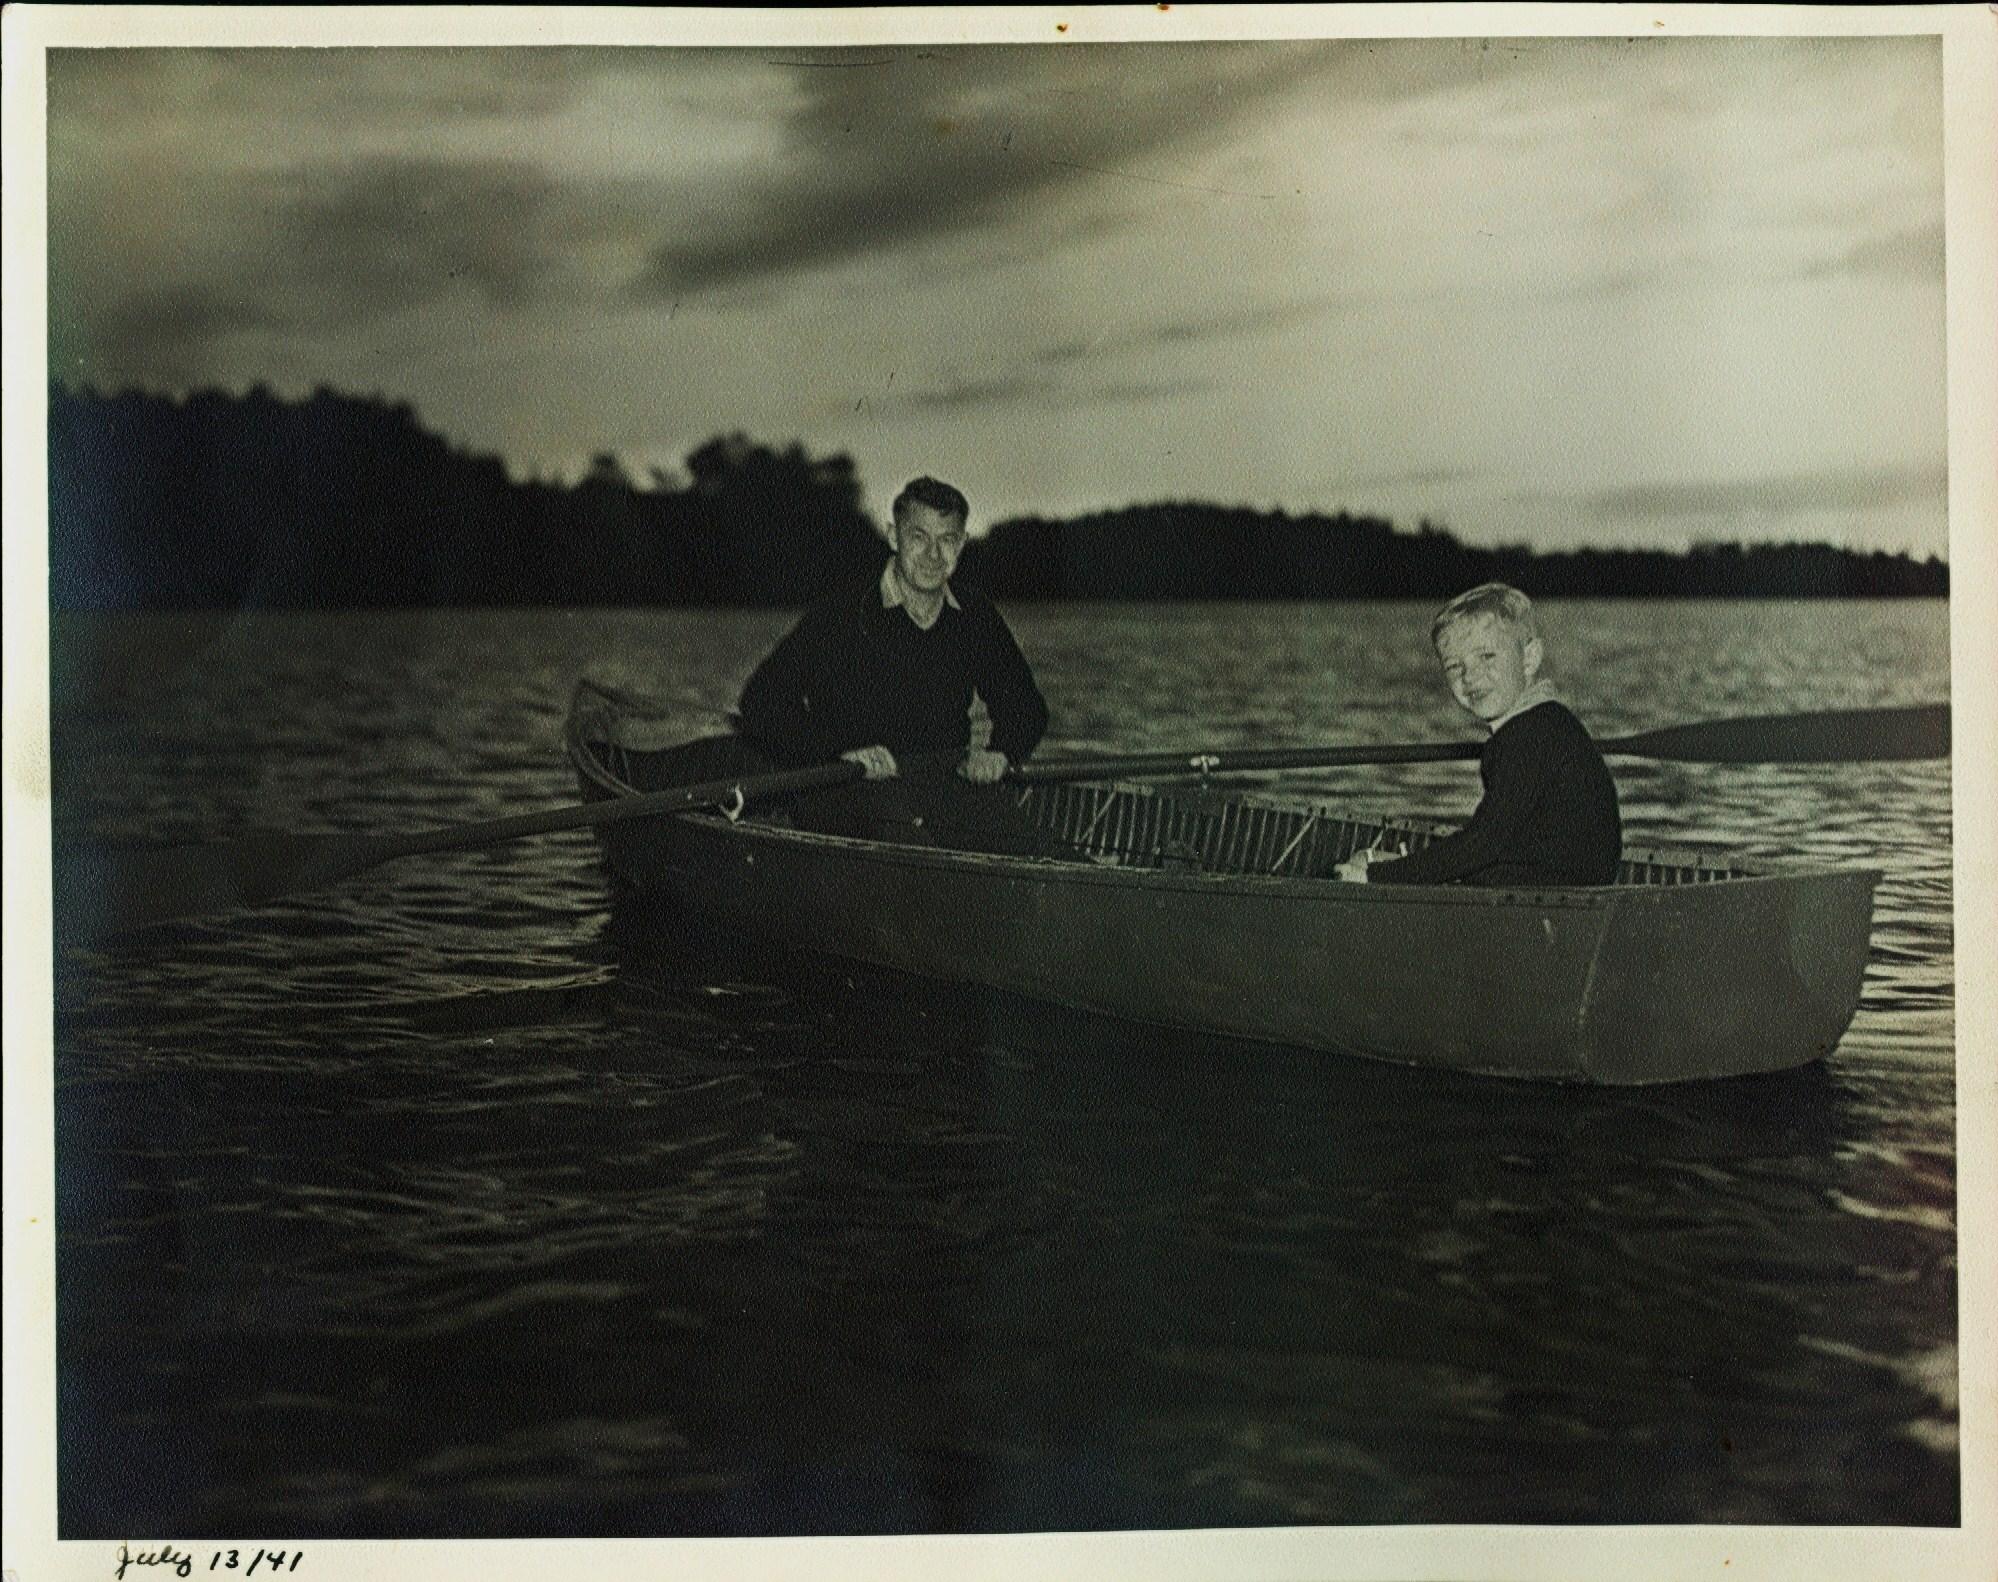 Boating Jimmie Hickey & Warren Hickey 1941